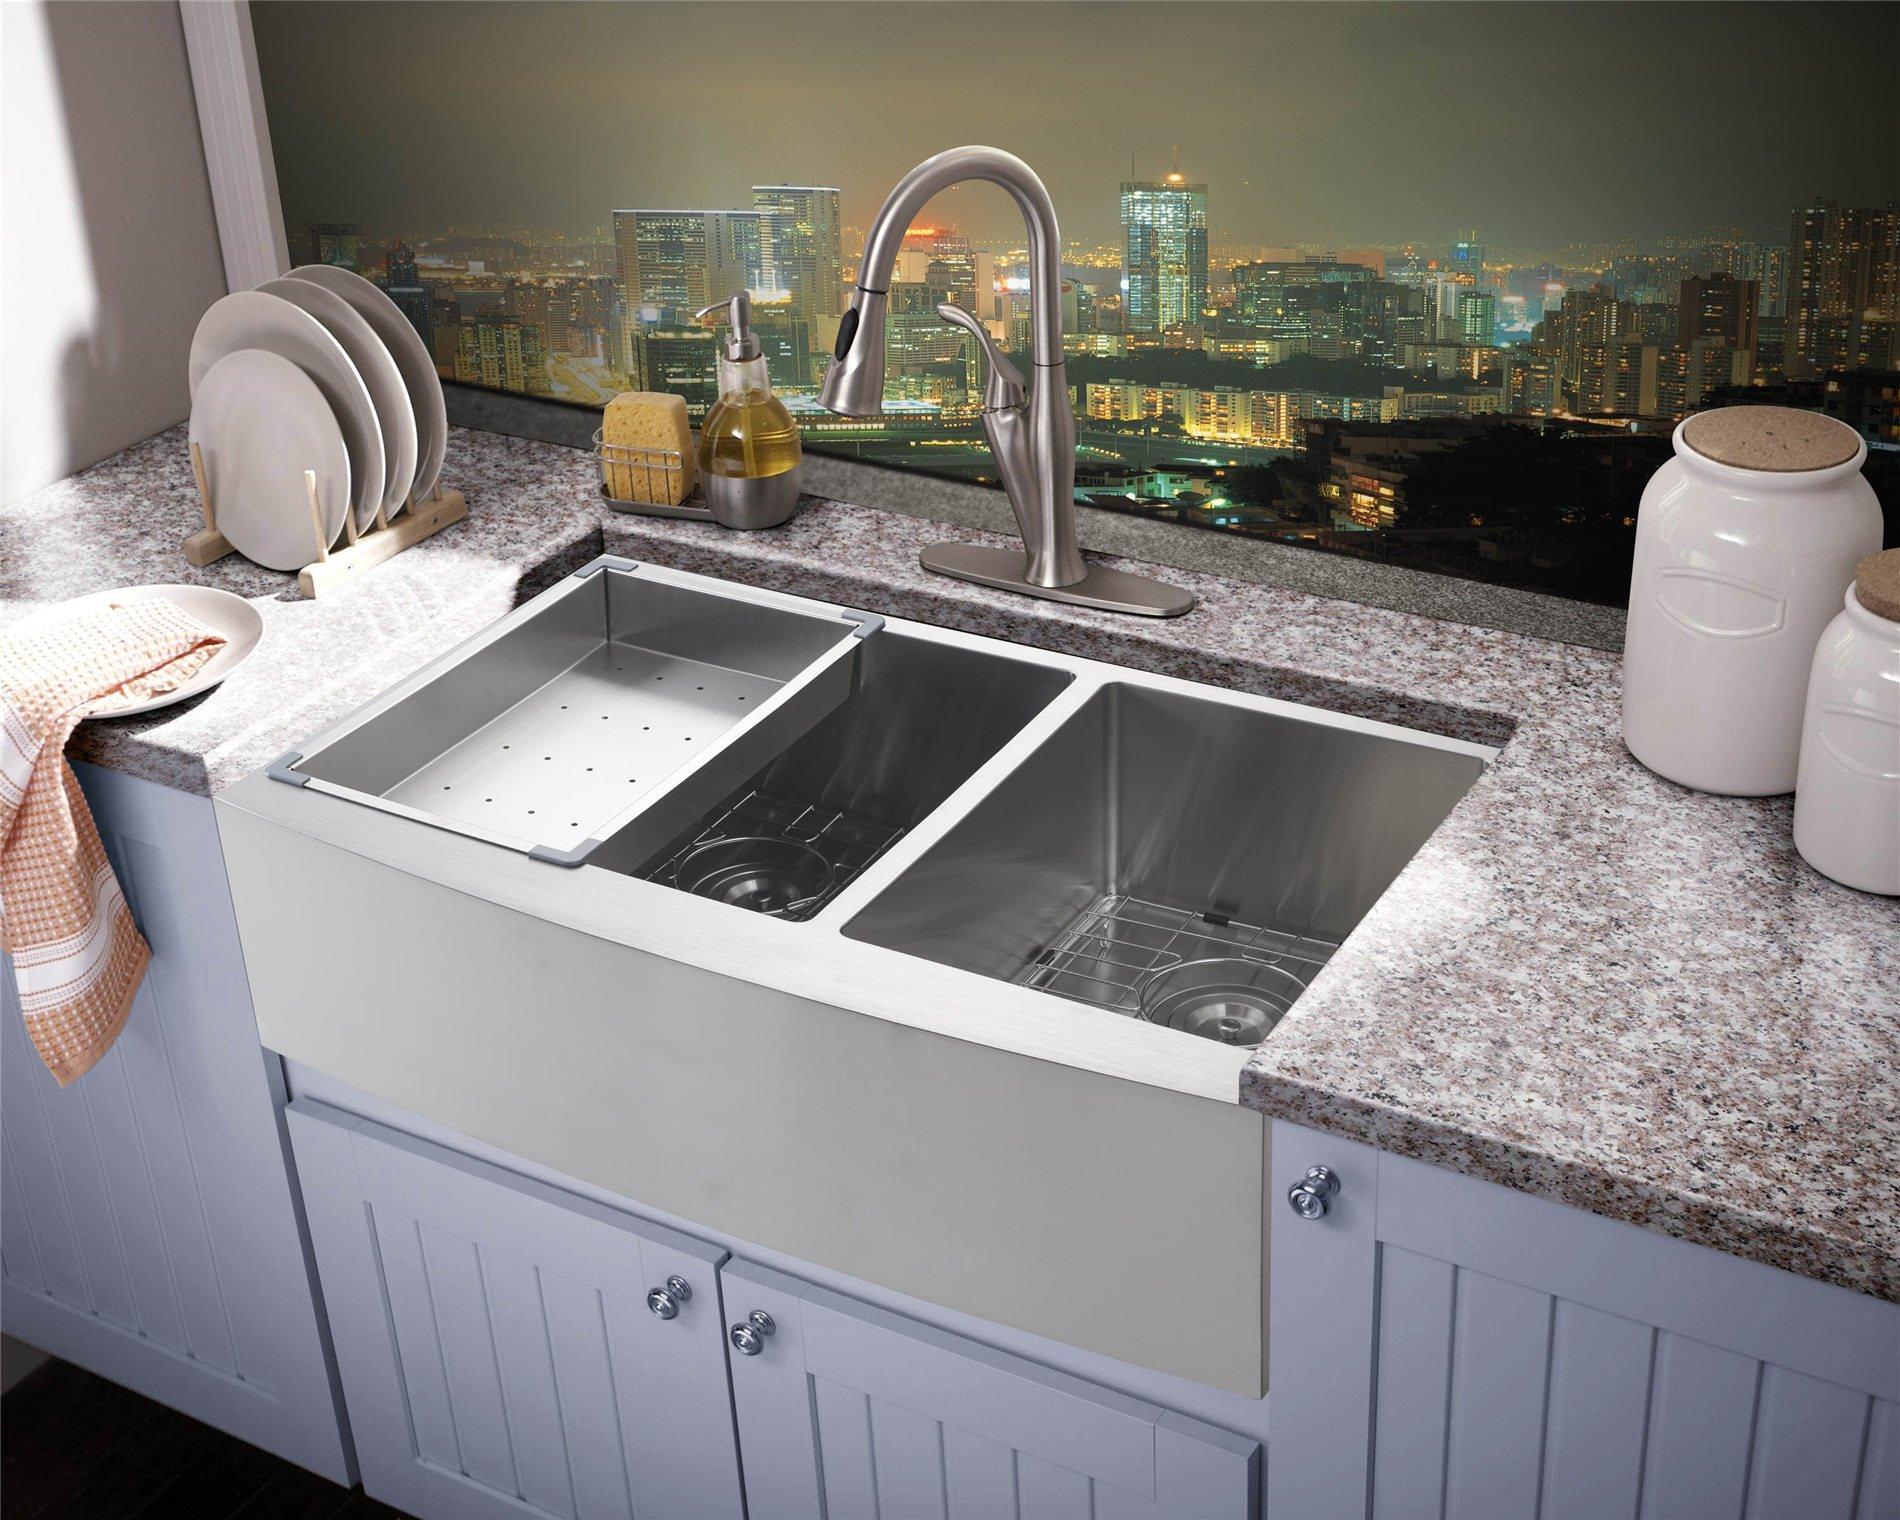 33x21 Inch Farmhouse Apron 60/40 Deep Double Bowl 16 Gauge Stainless Steel Luxury Kitchen Sink SuperSuper